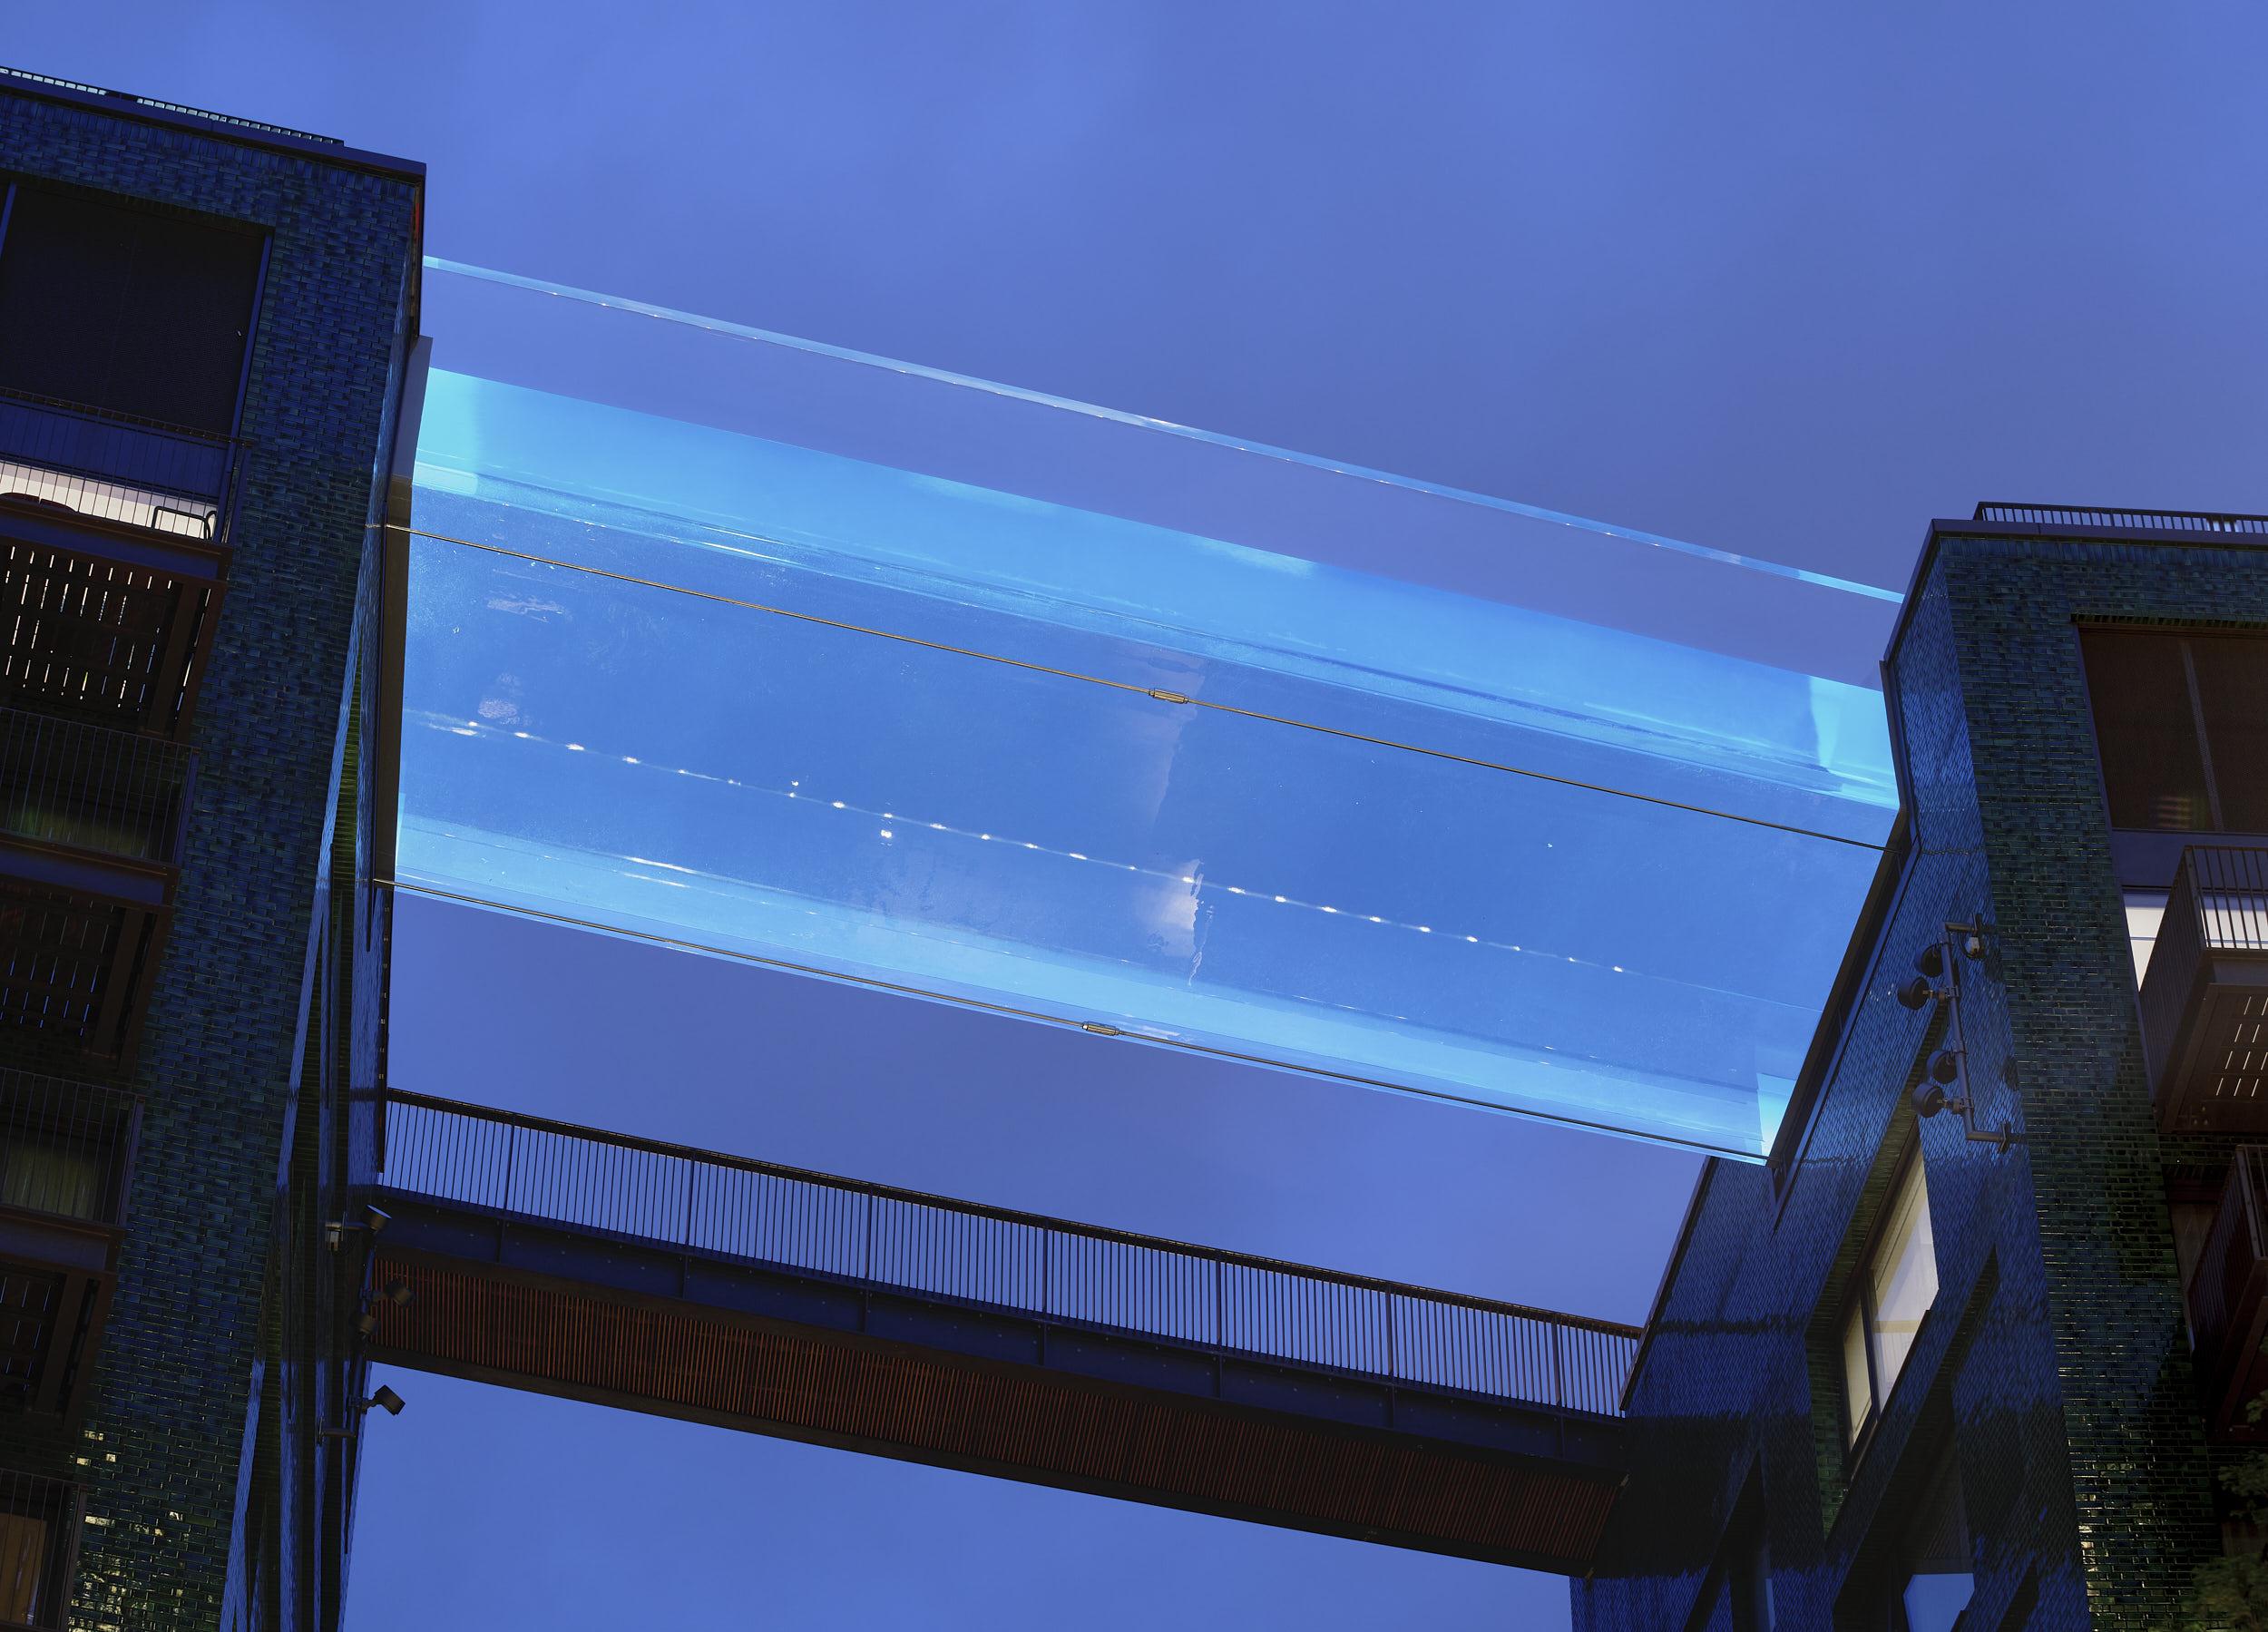 Night photography showing transparent pool architectrure.